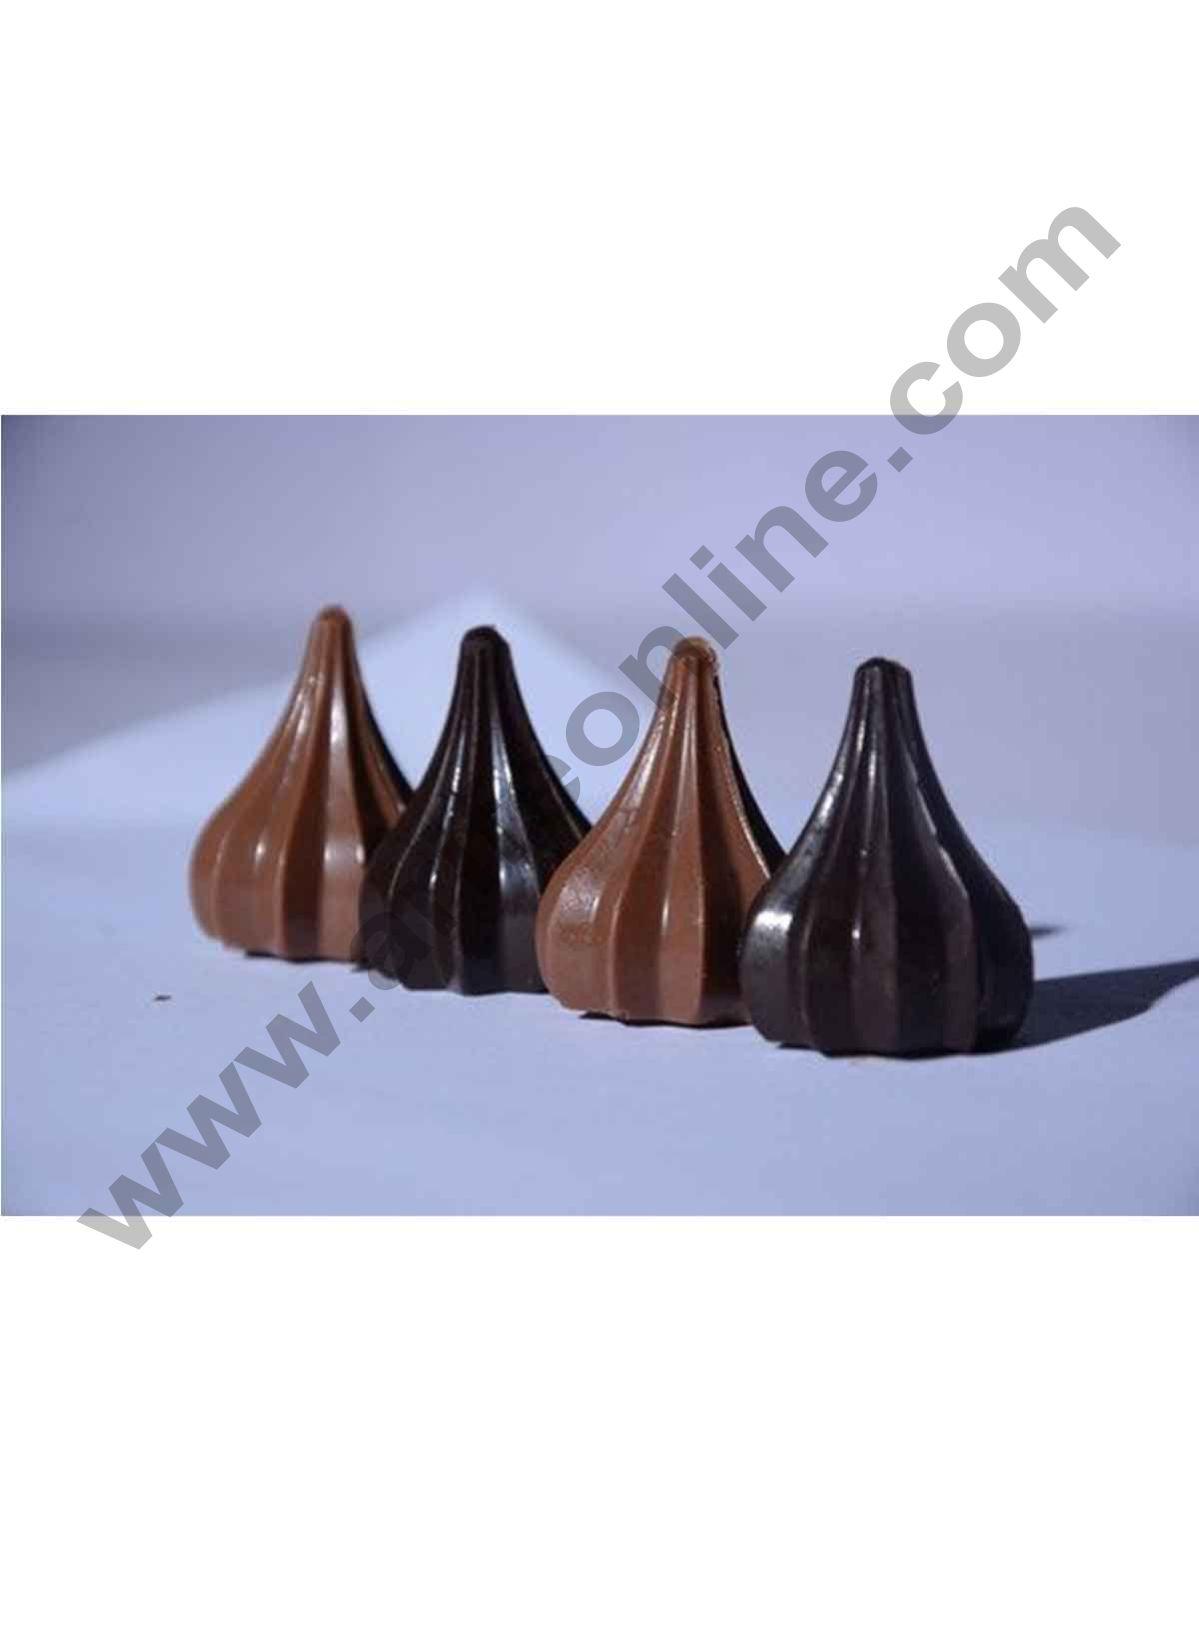 Cake Decor Modak Shape 8 Cavity Chocolate Mould, Silicone Molds for Chocolate, Chocolate Silicone Moulds, Silicon Brown Chocolate Moulds for Ganesh Chaturti Festivals